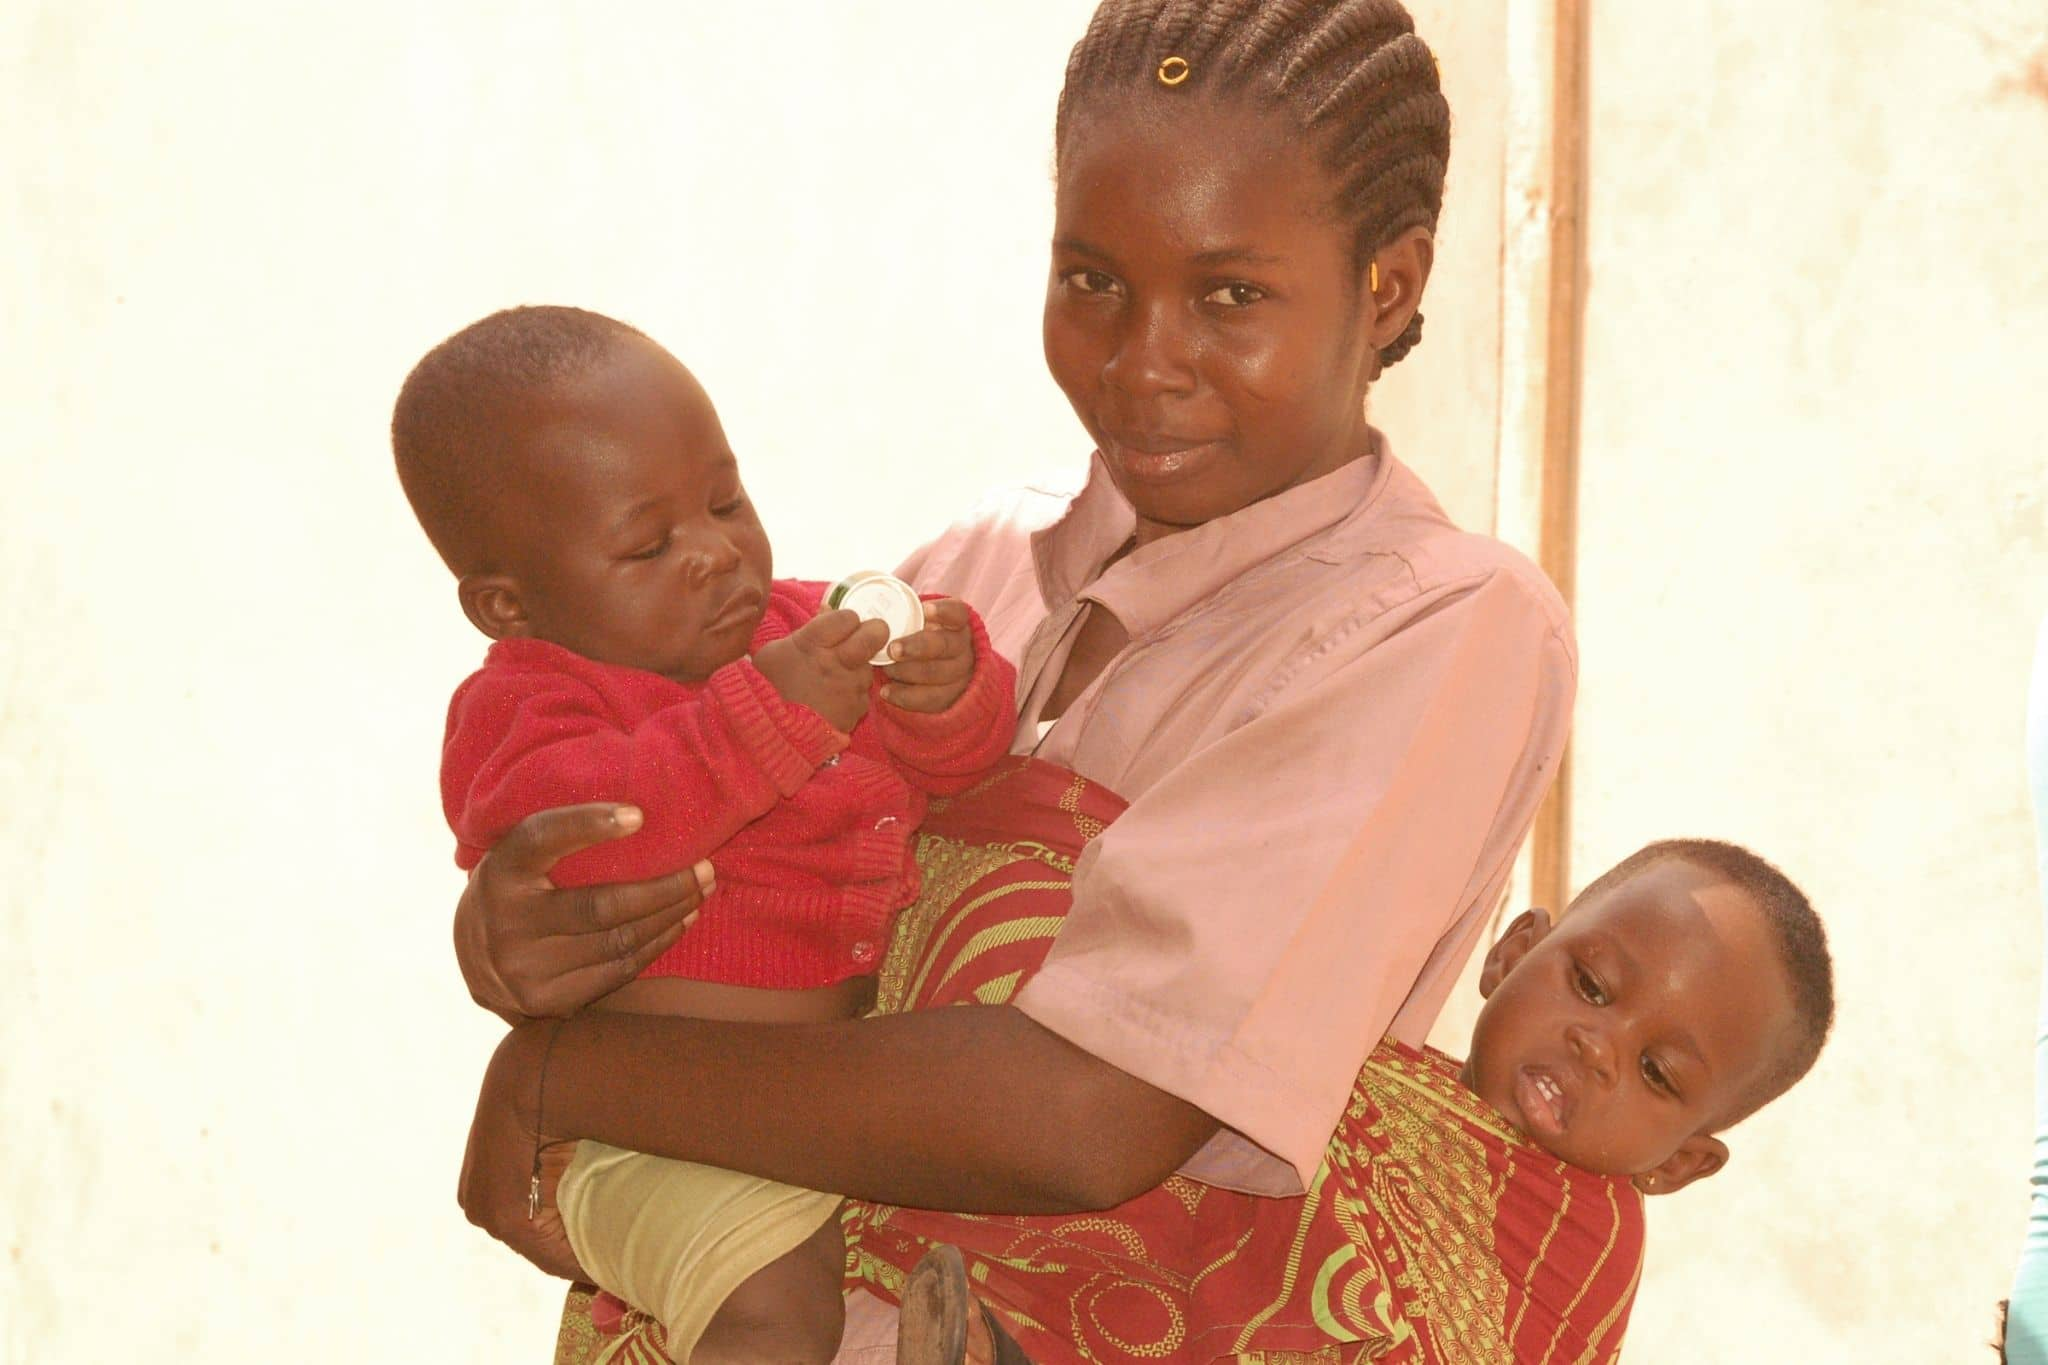 Maman au Burkina Faso